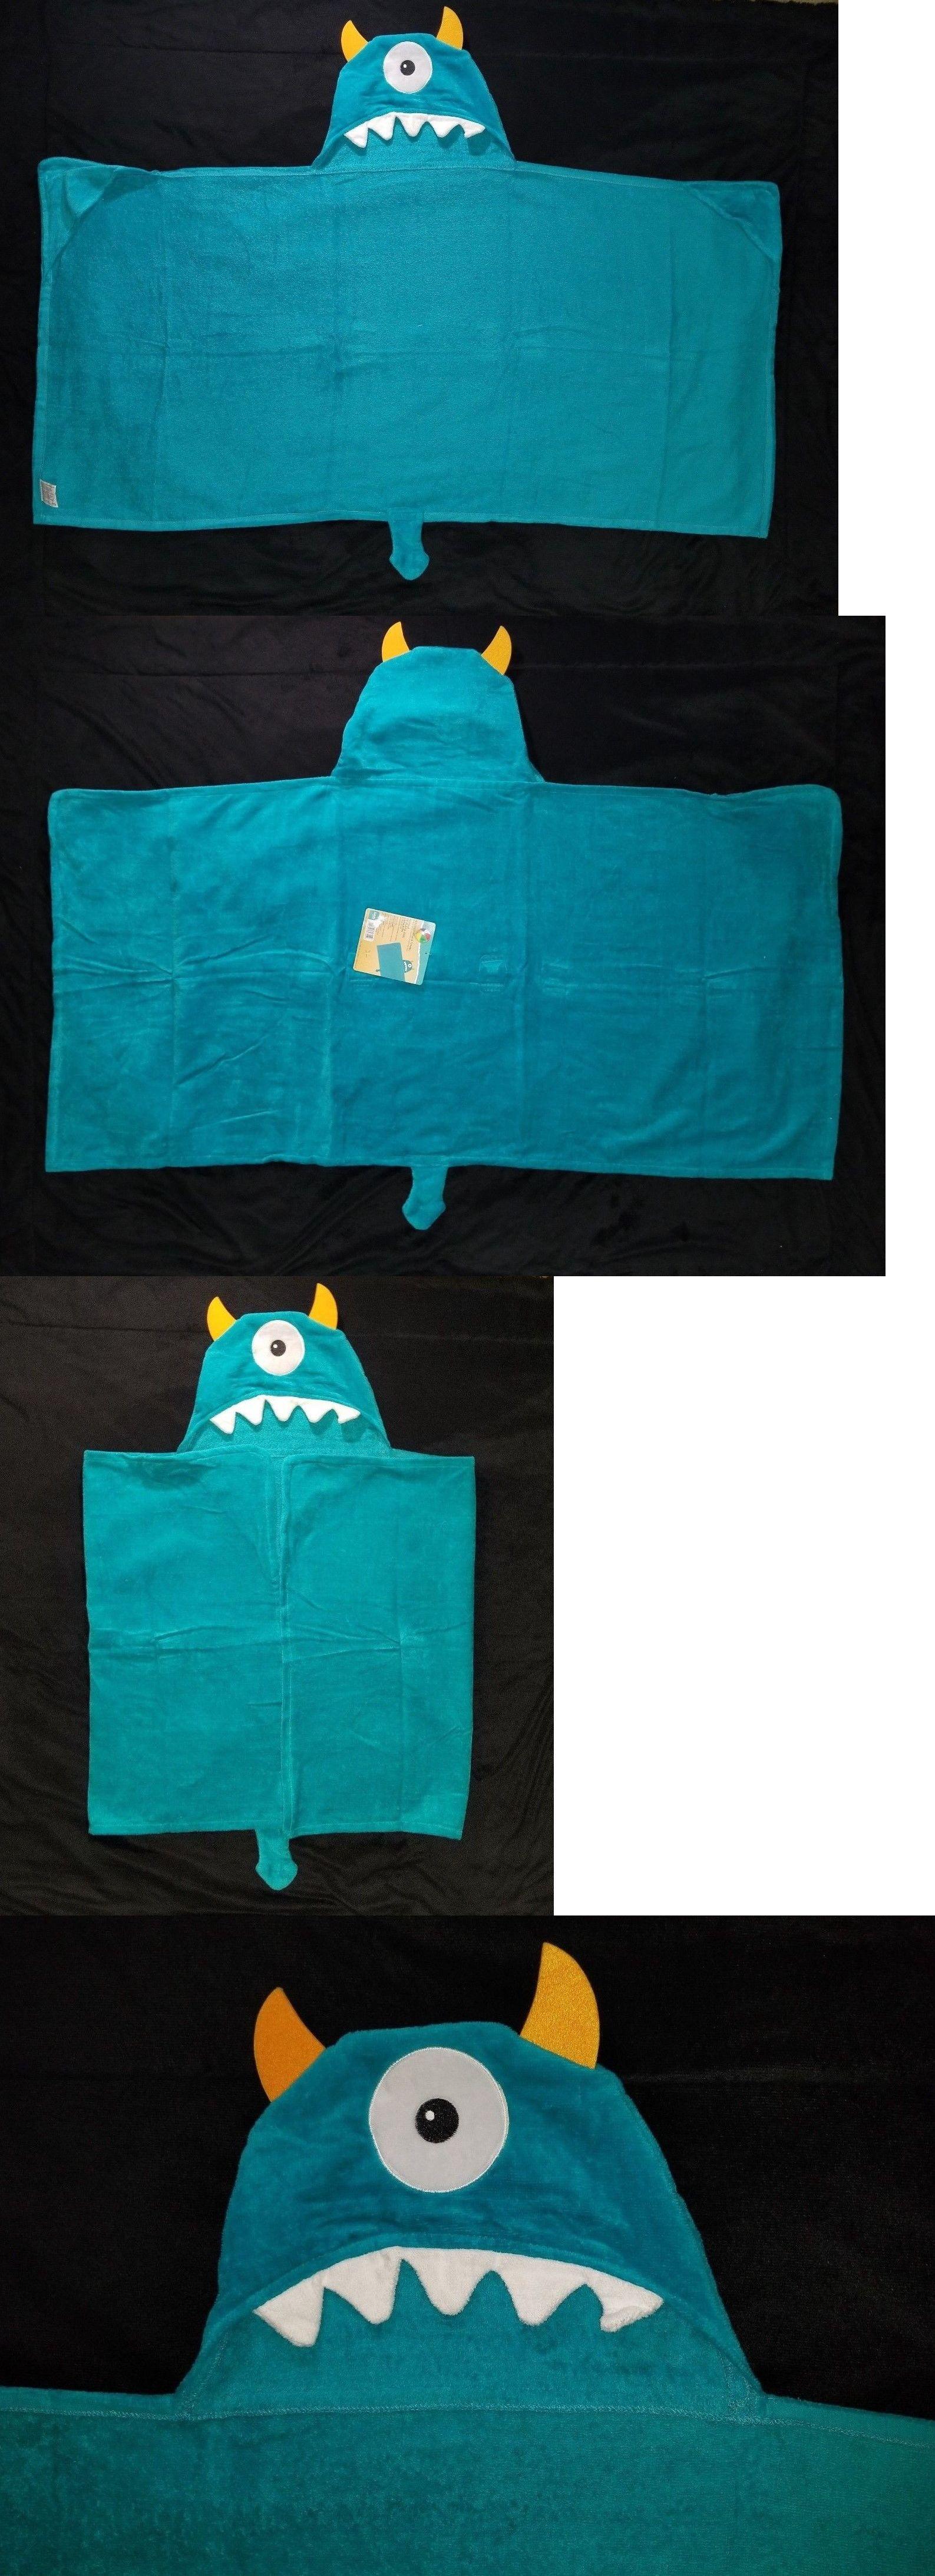 Bath 115624 kids one eyed monster hooded beach towel 24